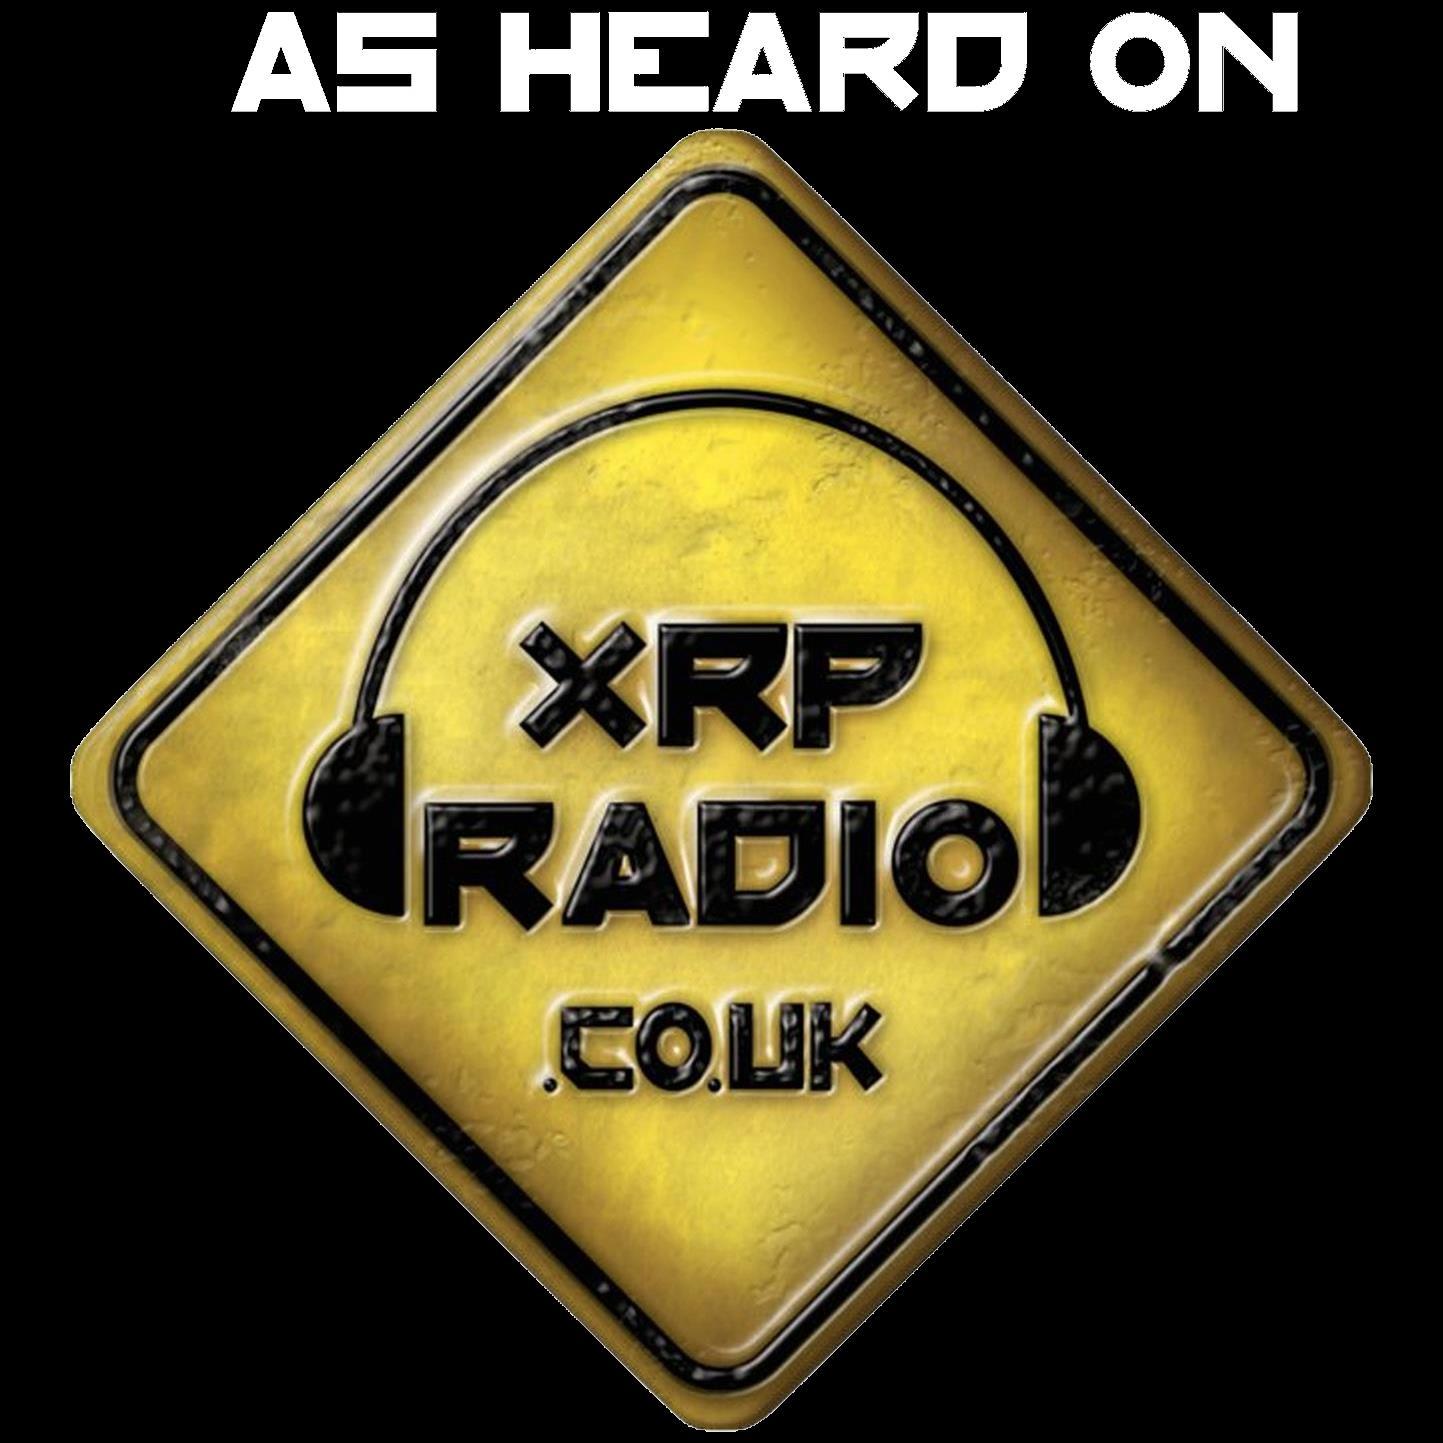 XRP Radio As Heard On.jpg